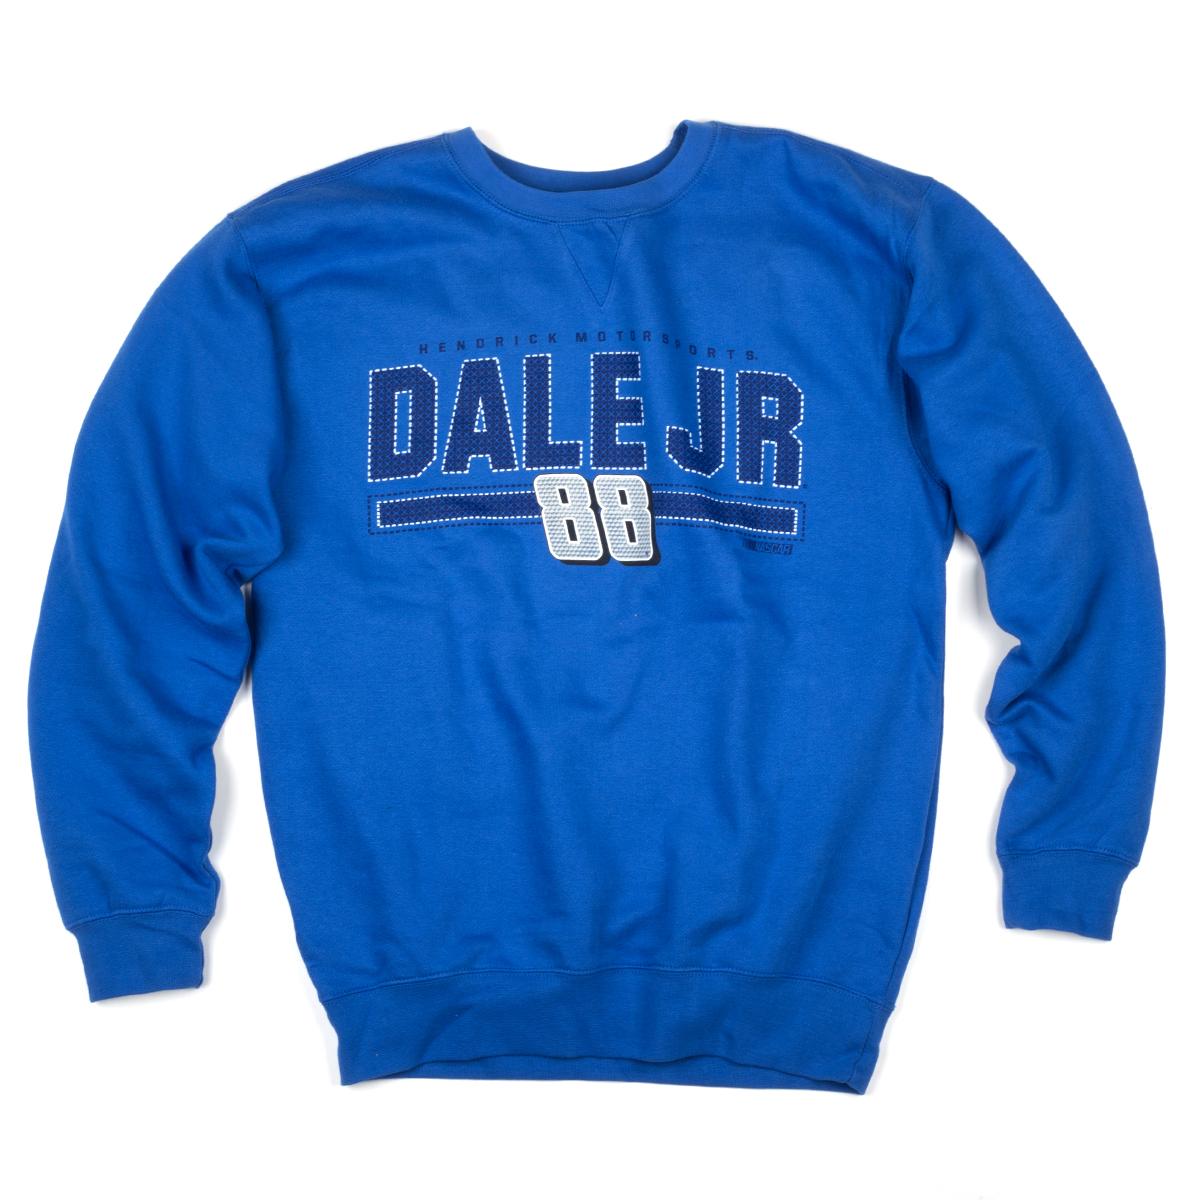 Dale Earnhardt, Jr. #88 Crewneck Fleece